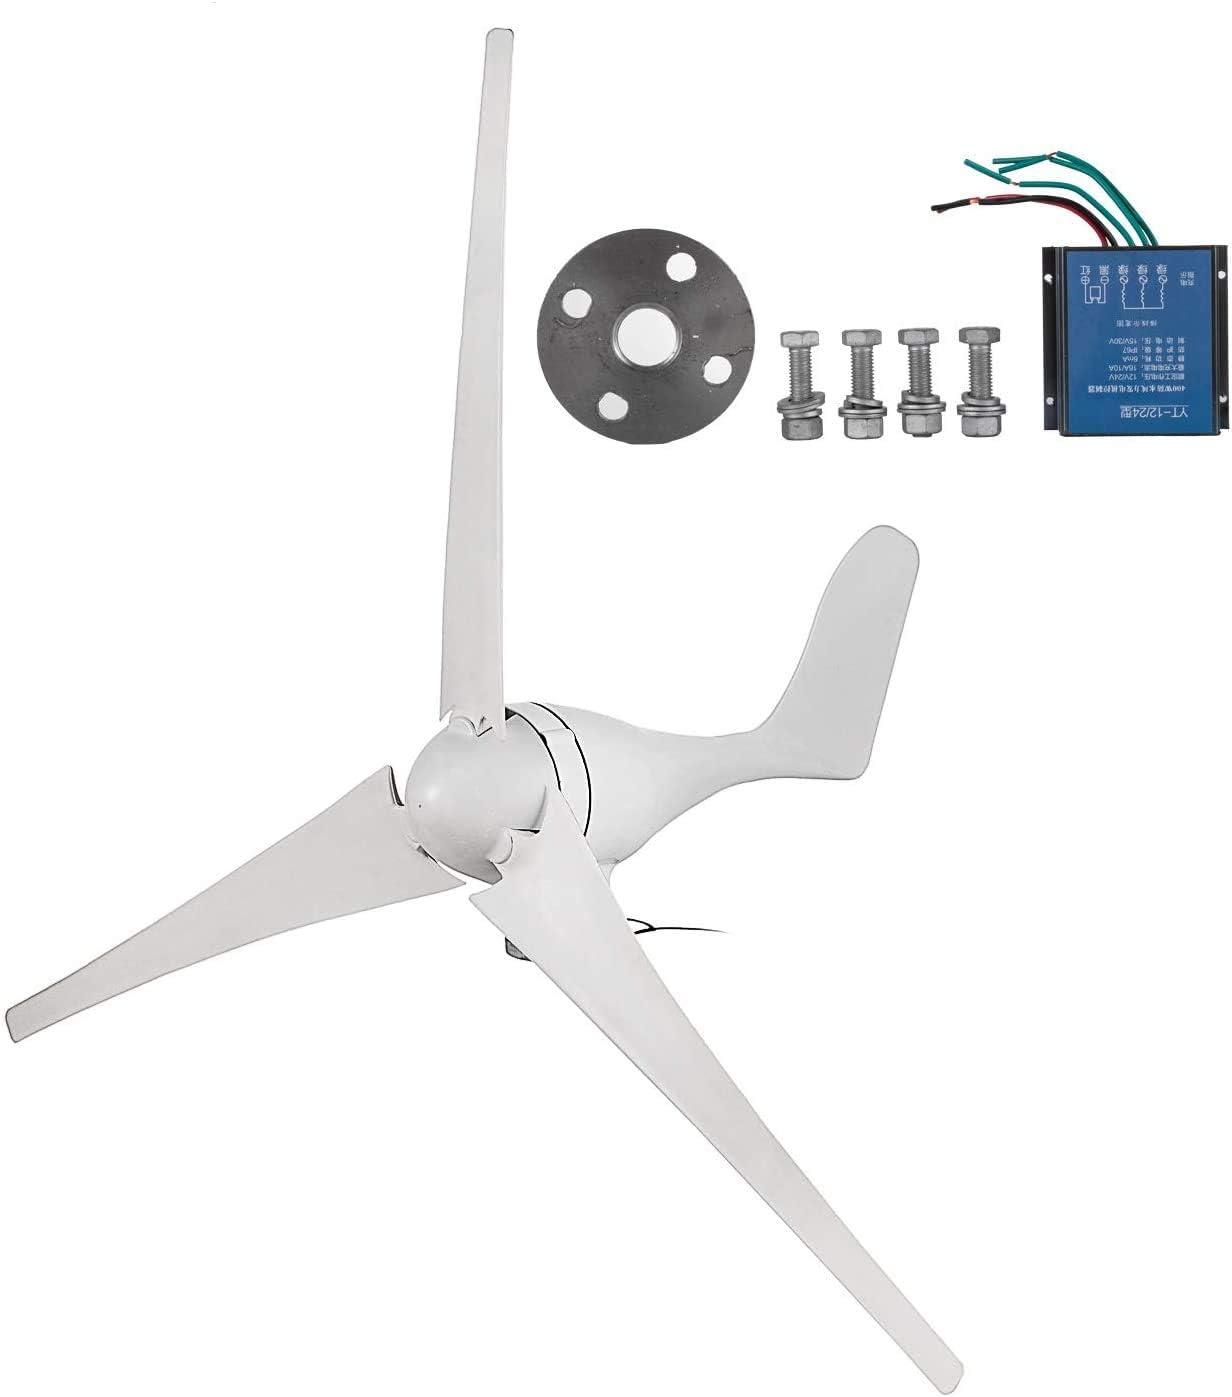 400W Windgenerator 20A Wind Windturbine Saubere Energie PBT Leaf